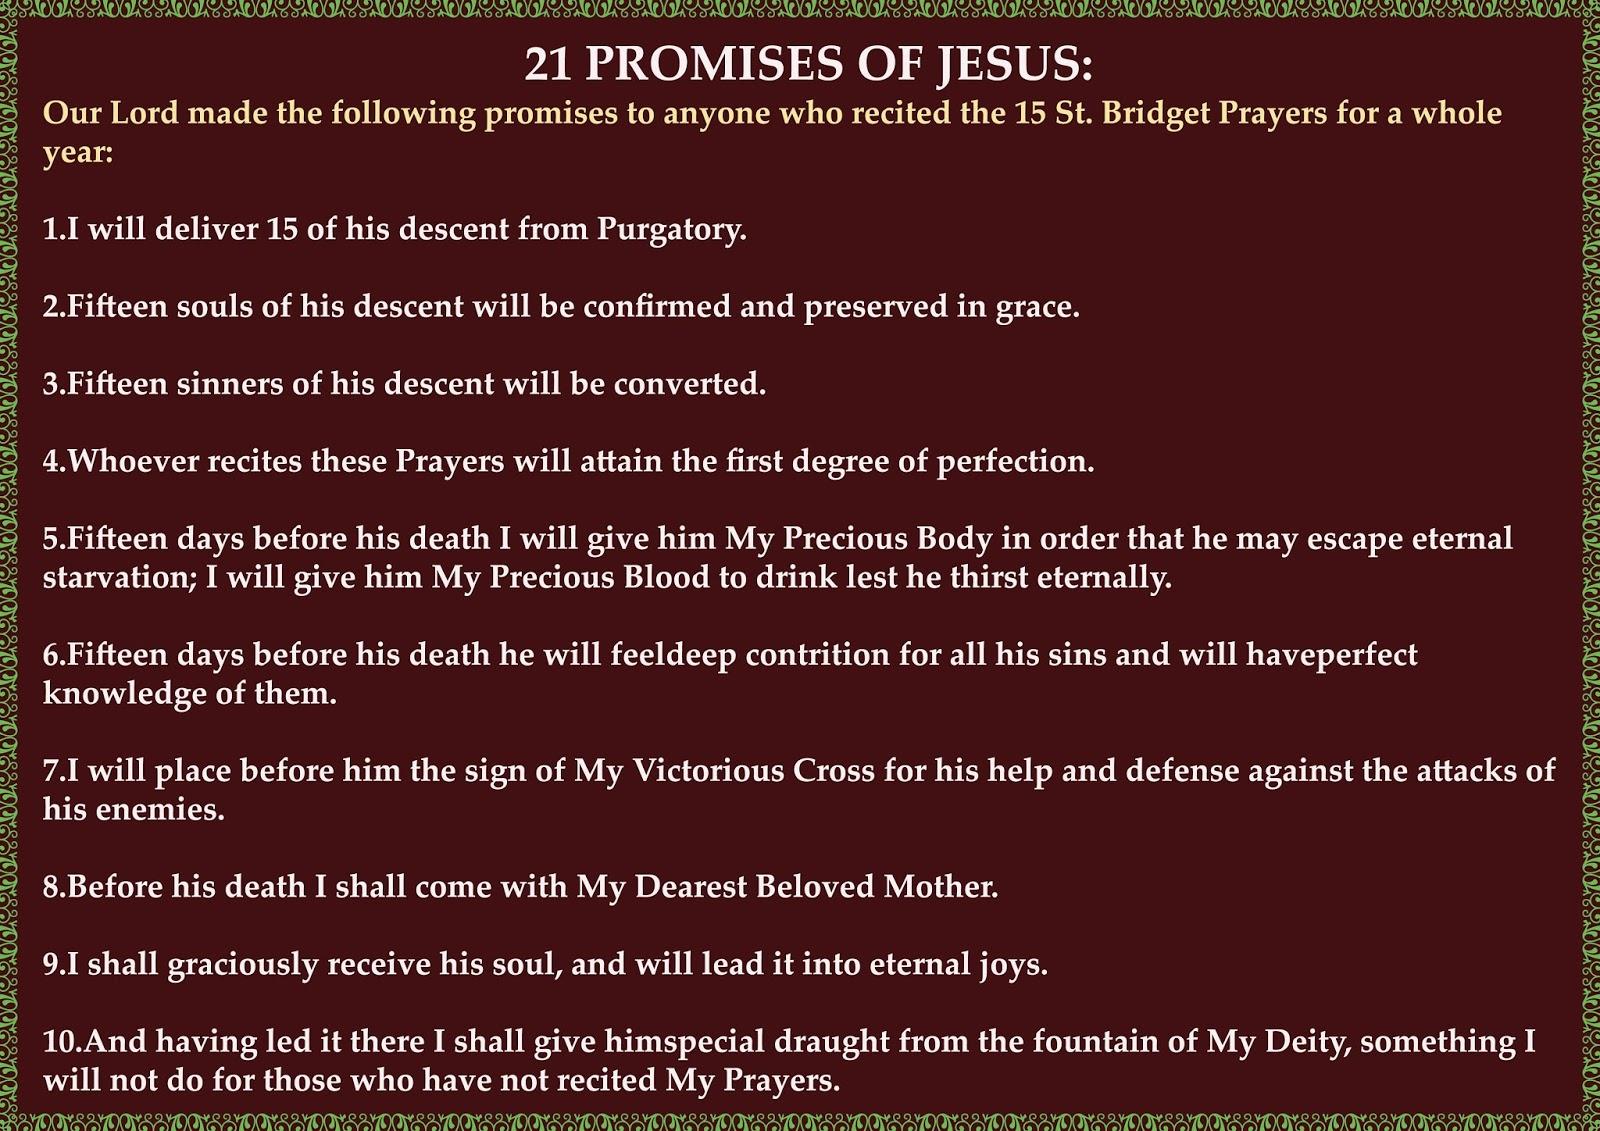 15 prayers of st bridget of sweden pdf